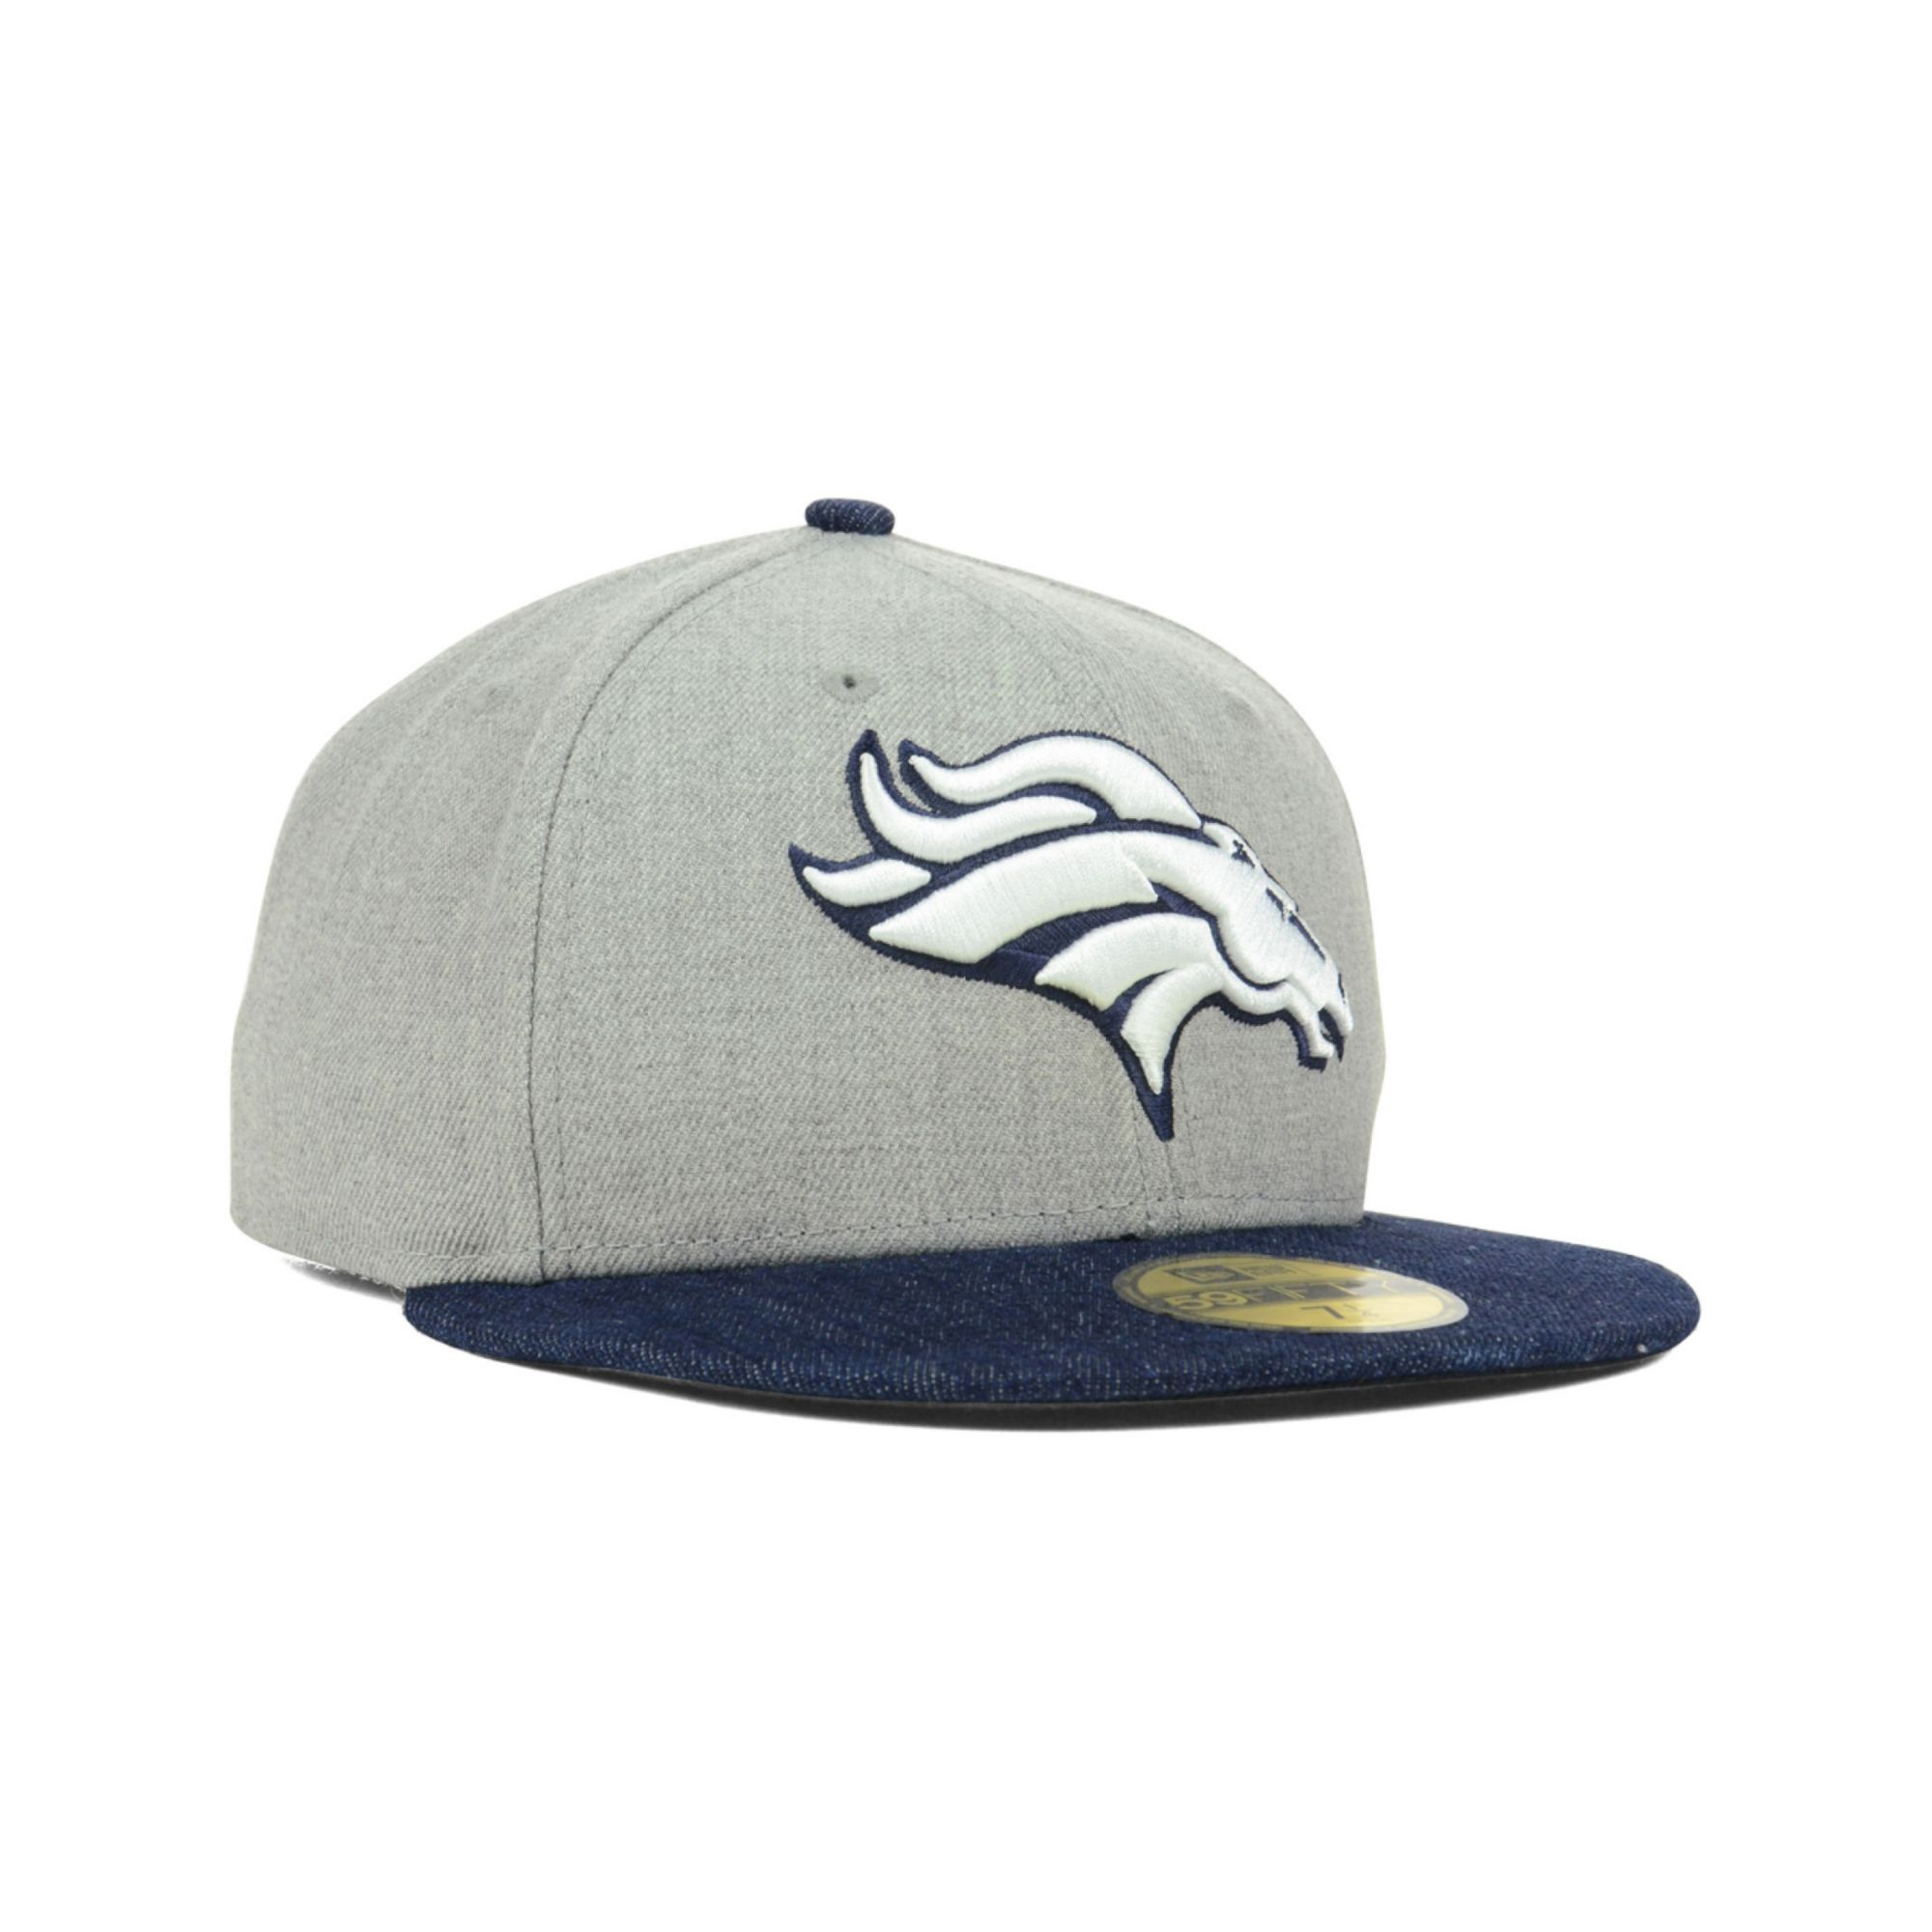 2f1fbc0fa83 Lyst - KTZ Denver Broncos Toppd Up Denim 59fifty Cap in Blue for Men